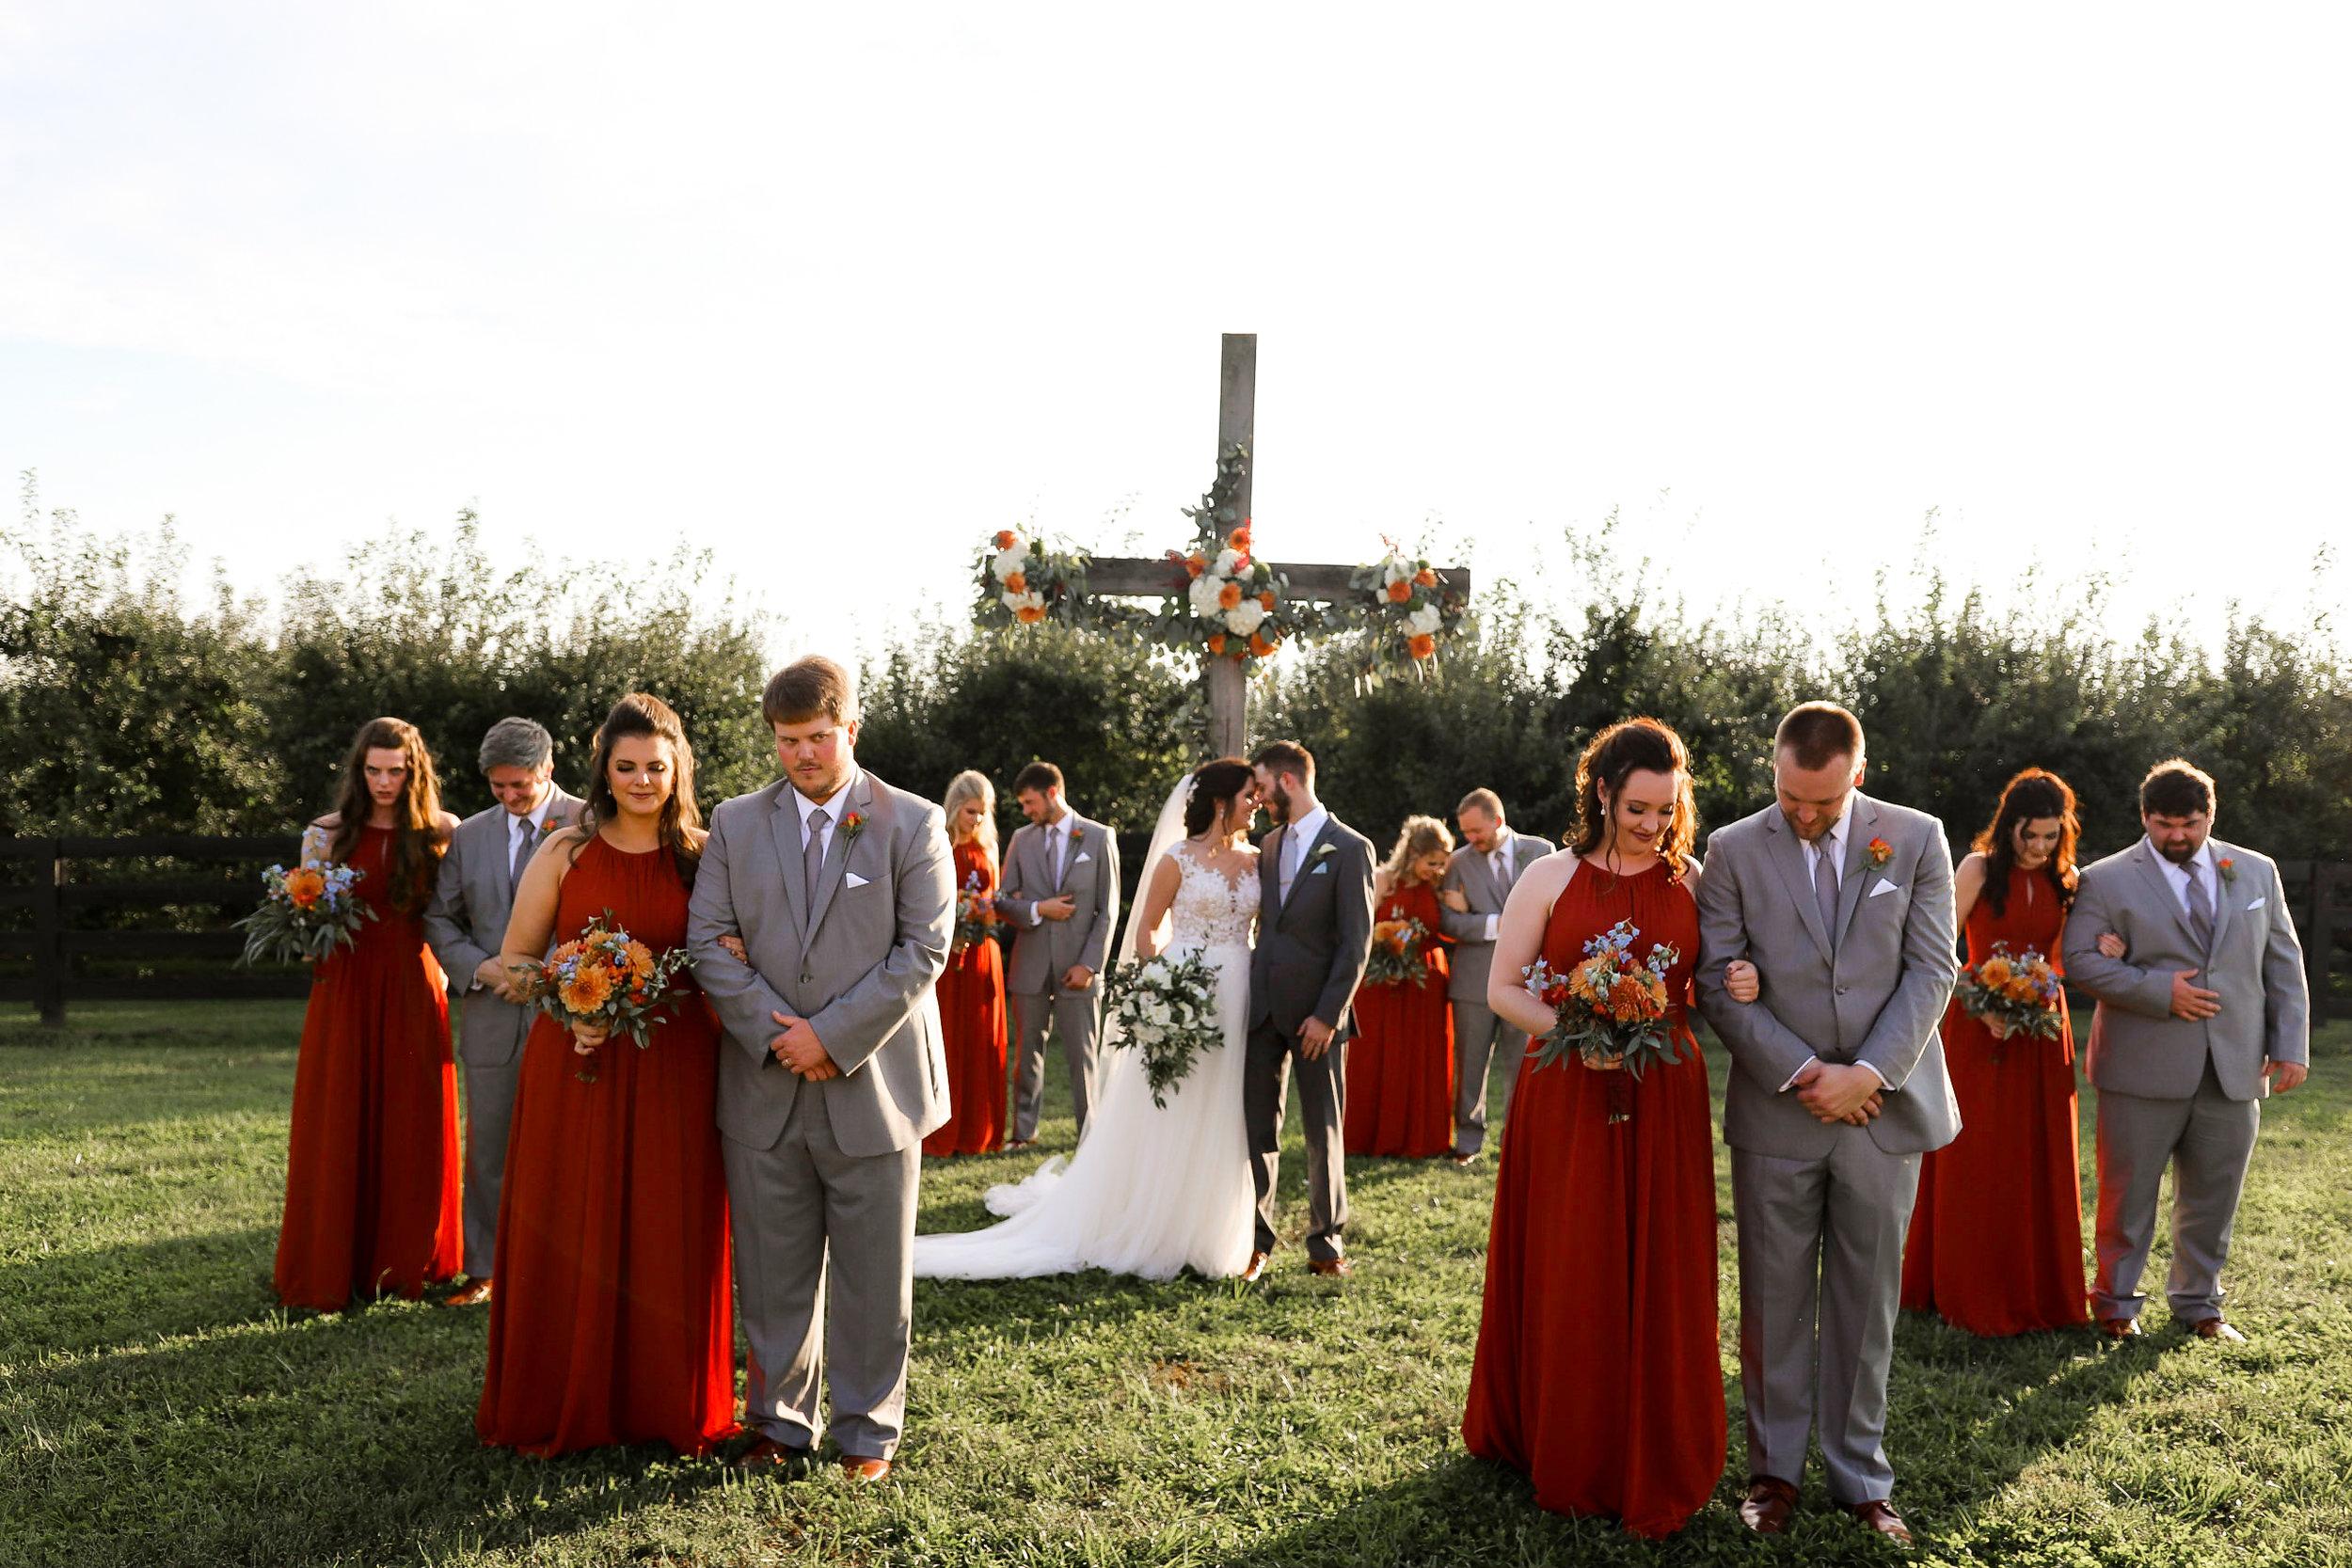 Evans-Orchard-Lexington-Kentucky-Fall-Wedding-21.jpg